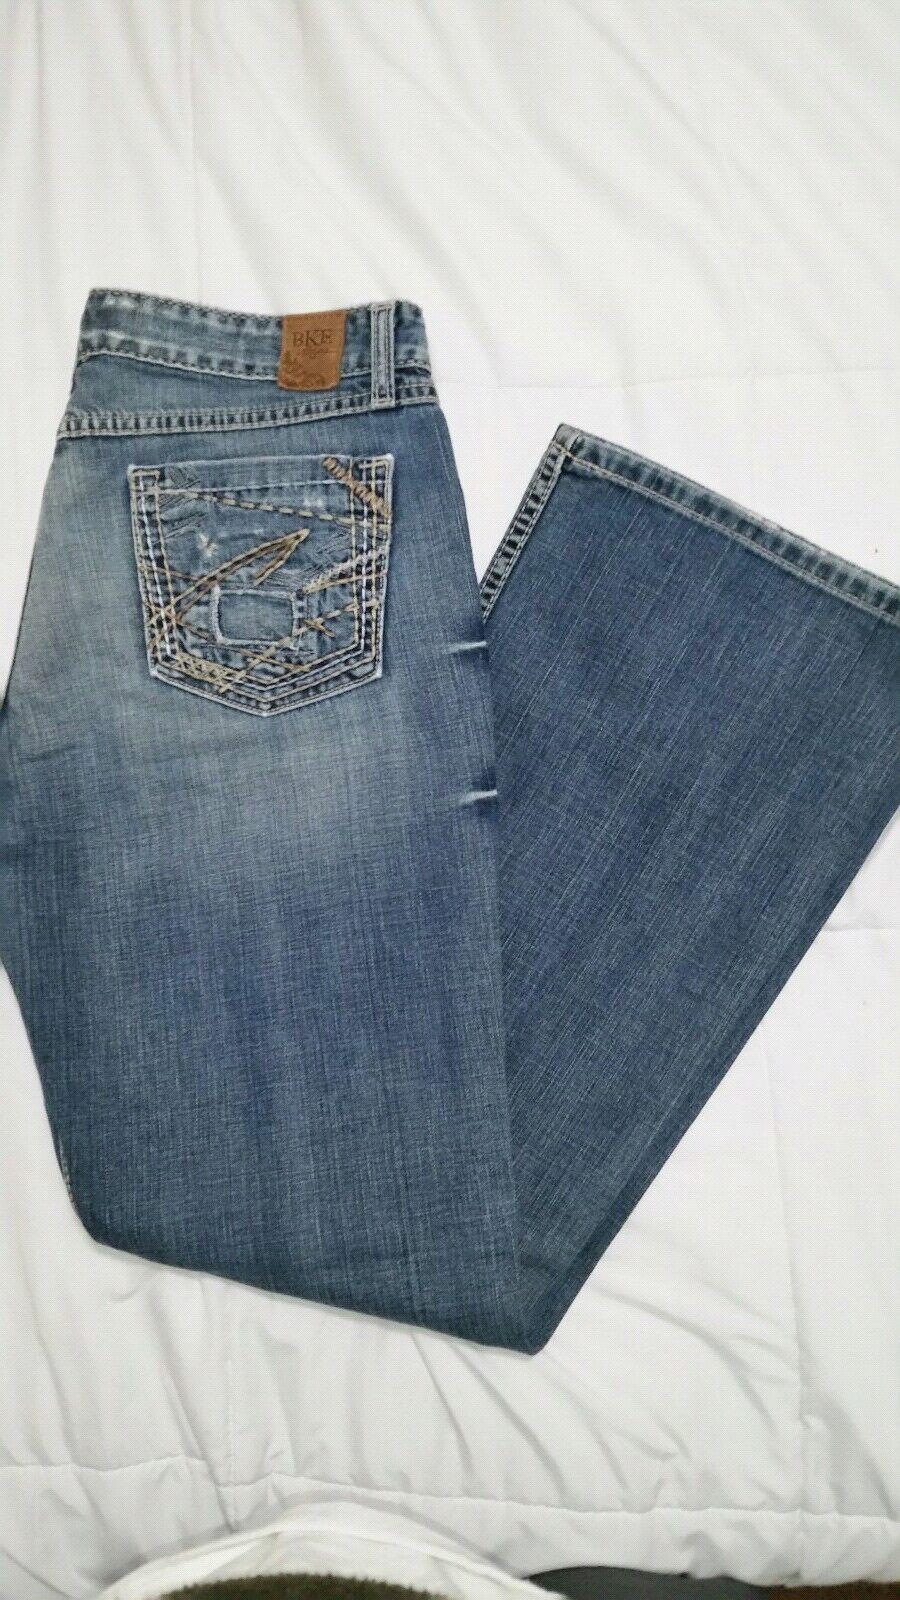 NWOT  BKE Denim Star Stretch Womens Med bluee Distress Jeans Size 31R, 31 x 311 2